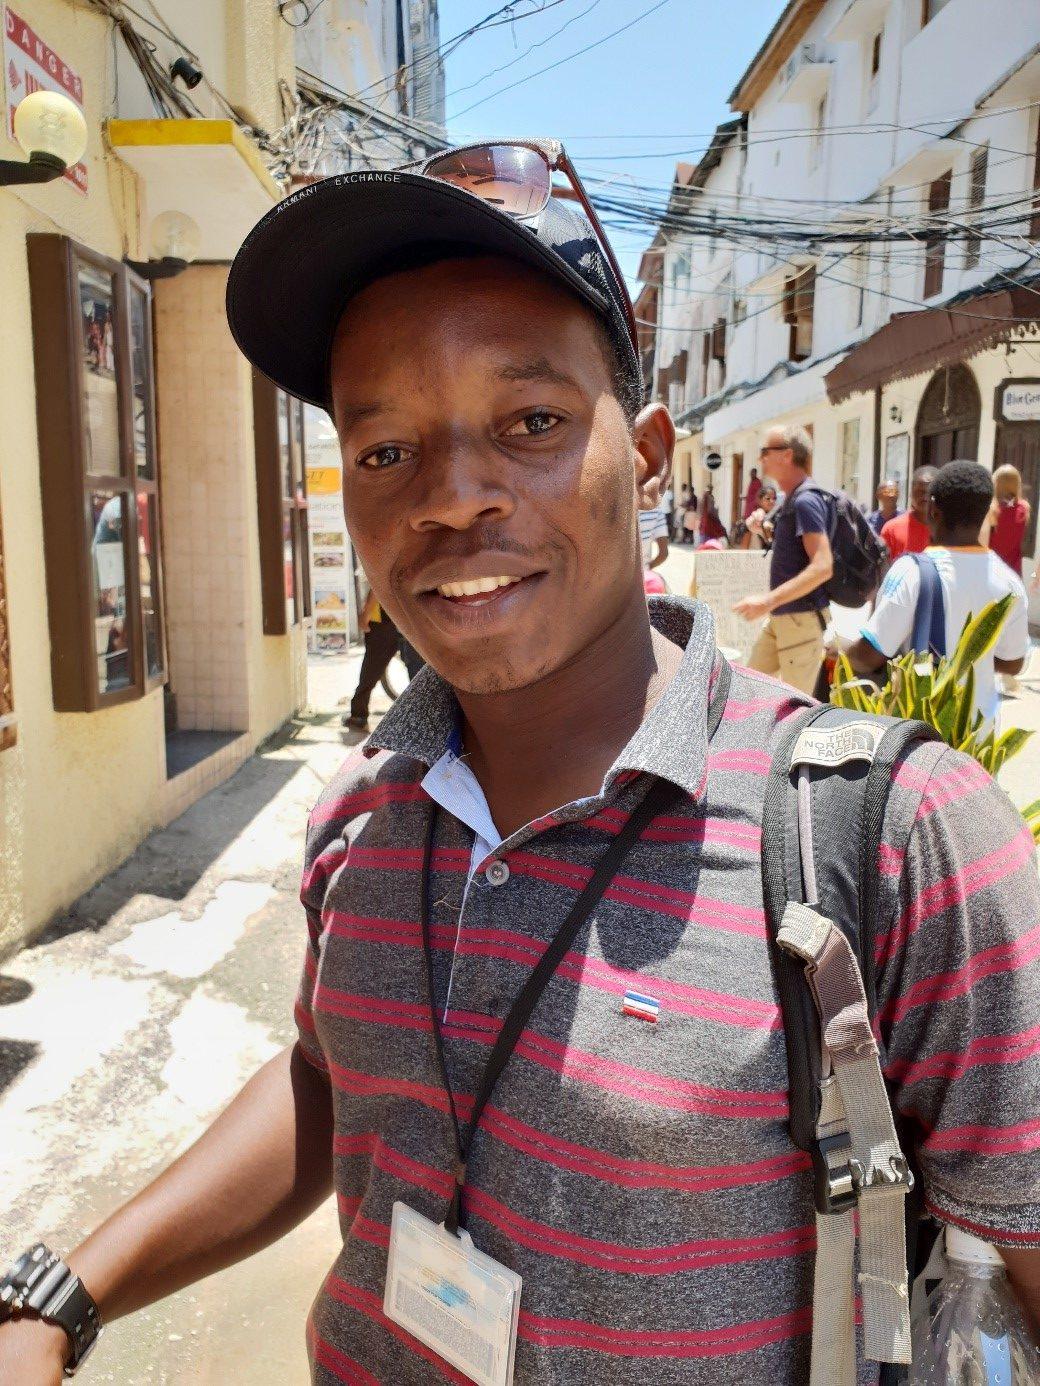 lokale gider på Zanzibar